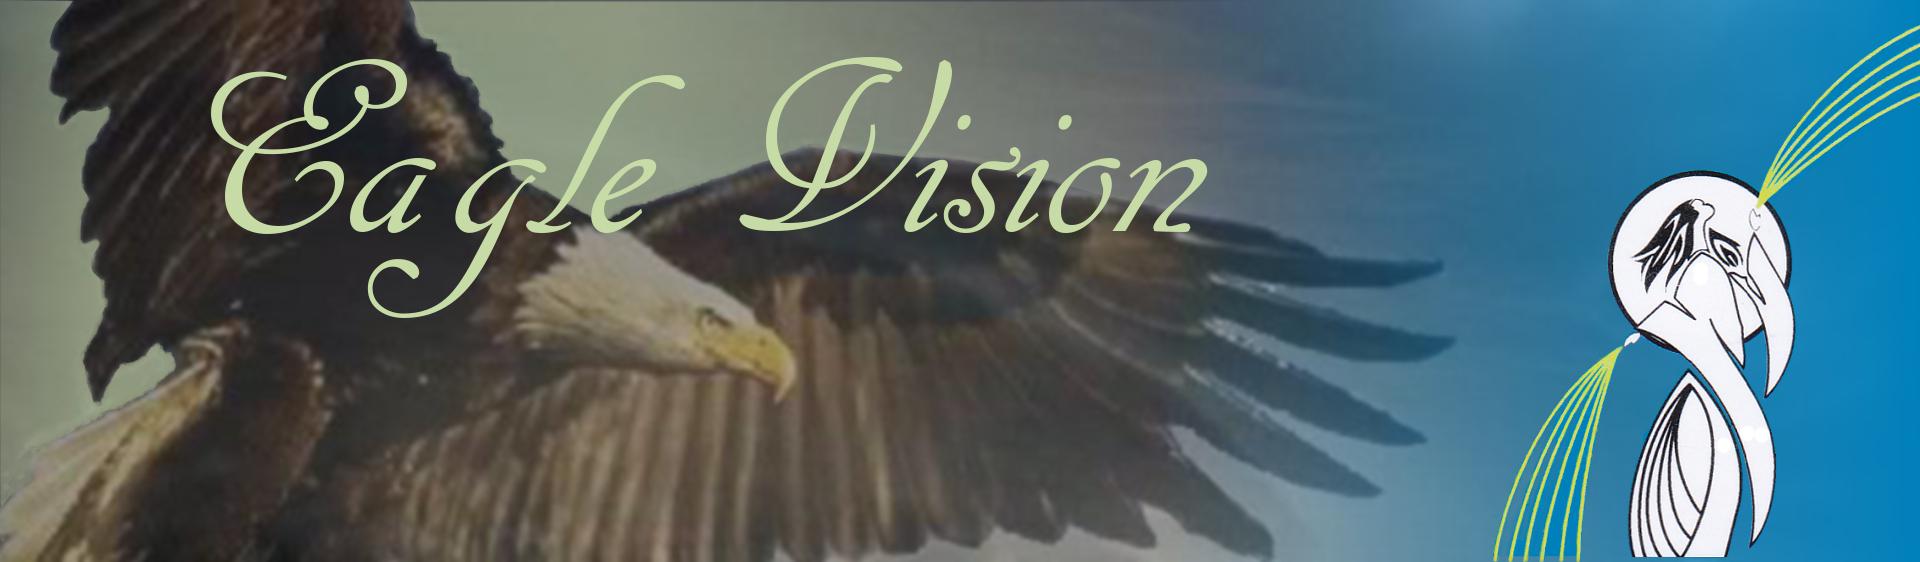 Eagle Vision Shamanic Healing